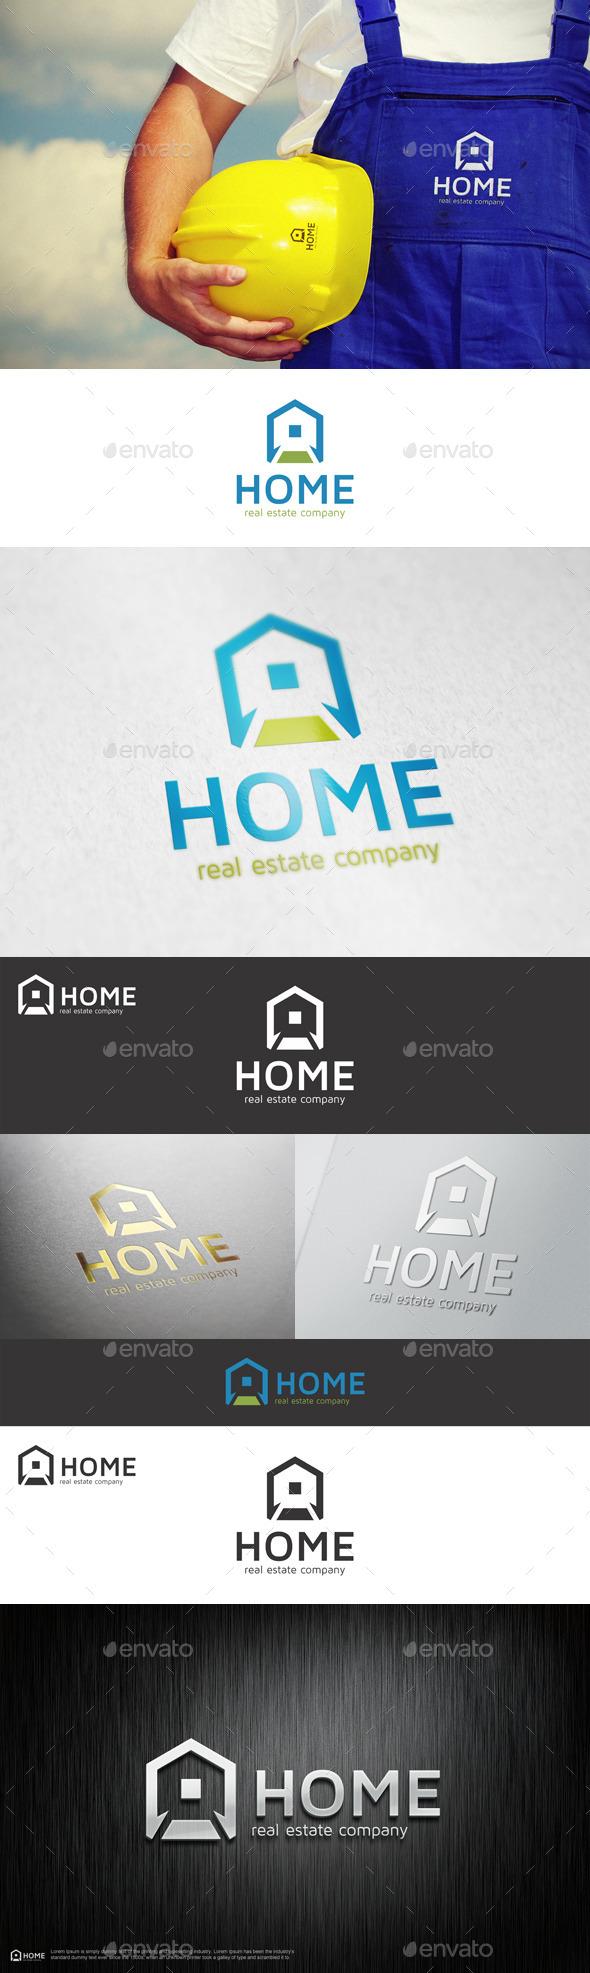 GraphicRiver Home Real Estate Company Logo 10965417